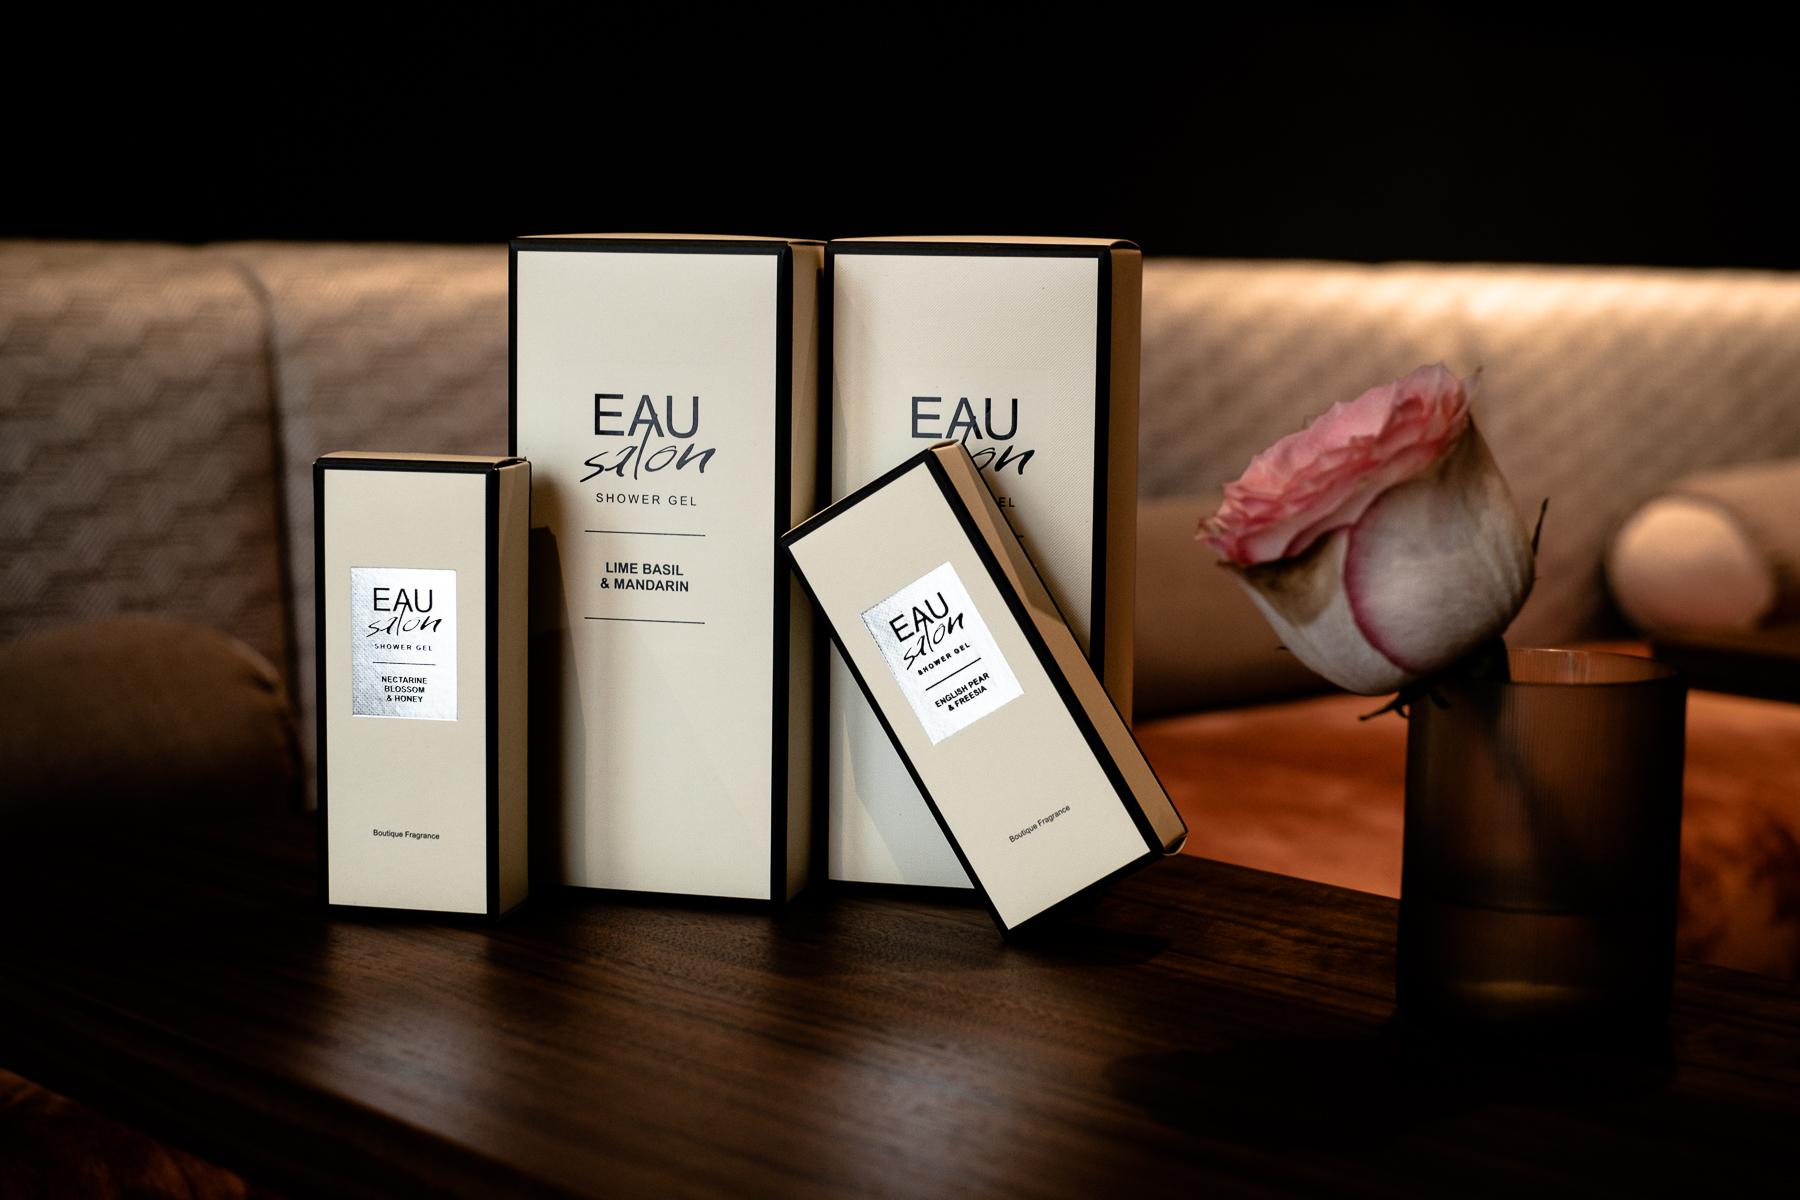 EAU Salon Shower Gel - FujiFilmXT3 - Yes! Please Enjoy-44.jpg